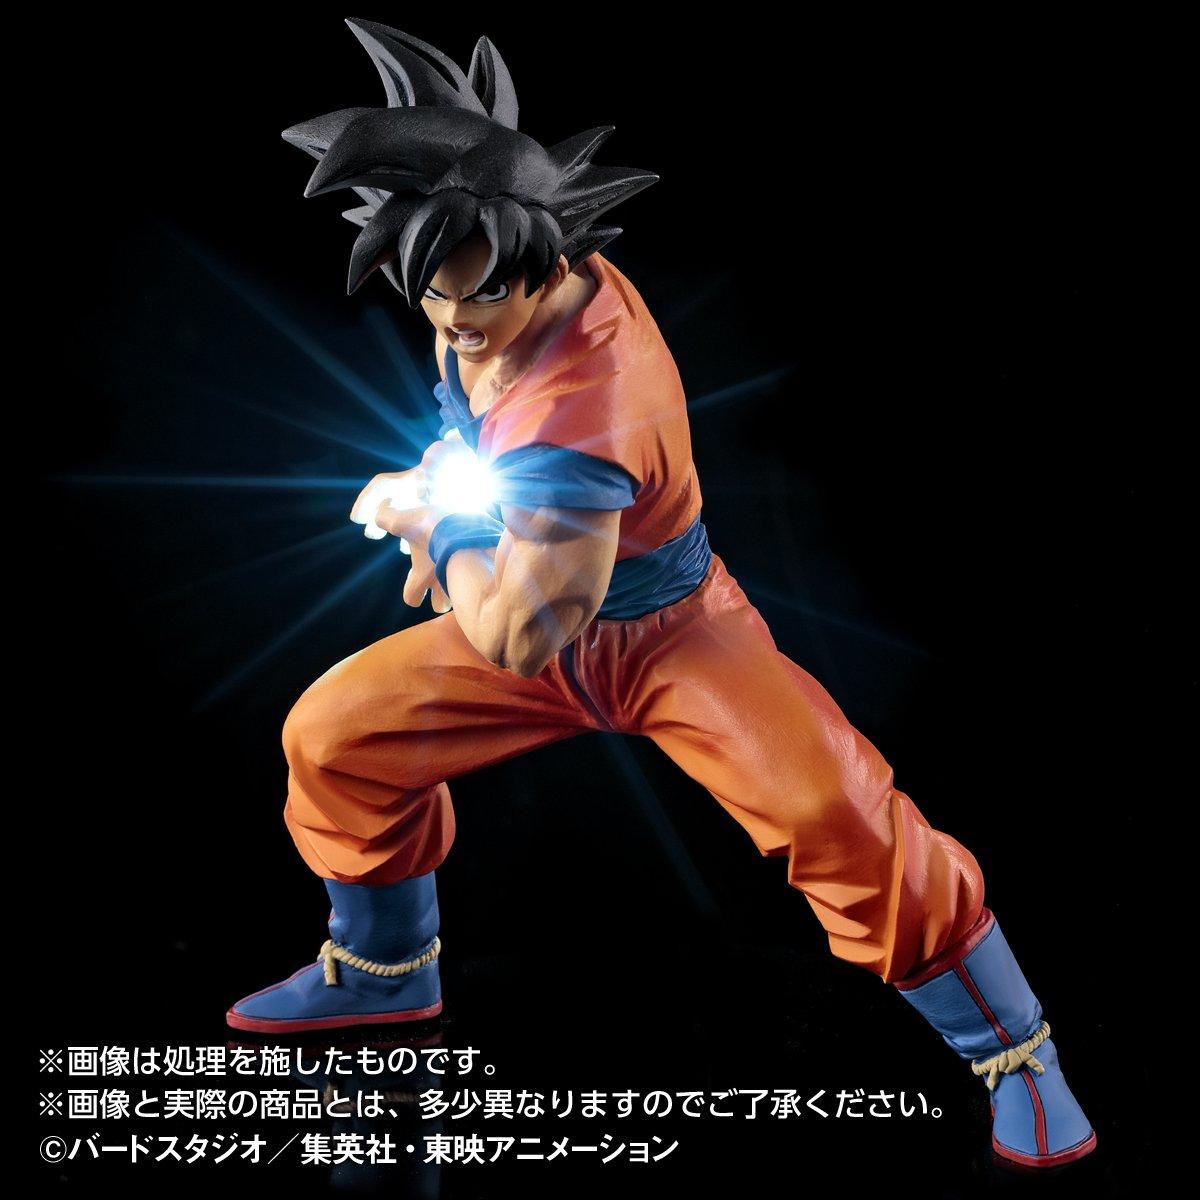 Dragon Ball Z - HG Son Goku (Limited Pre-order)